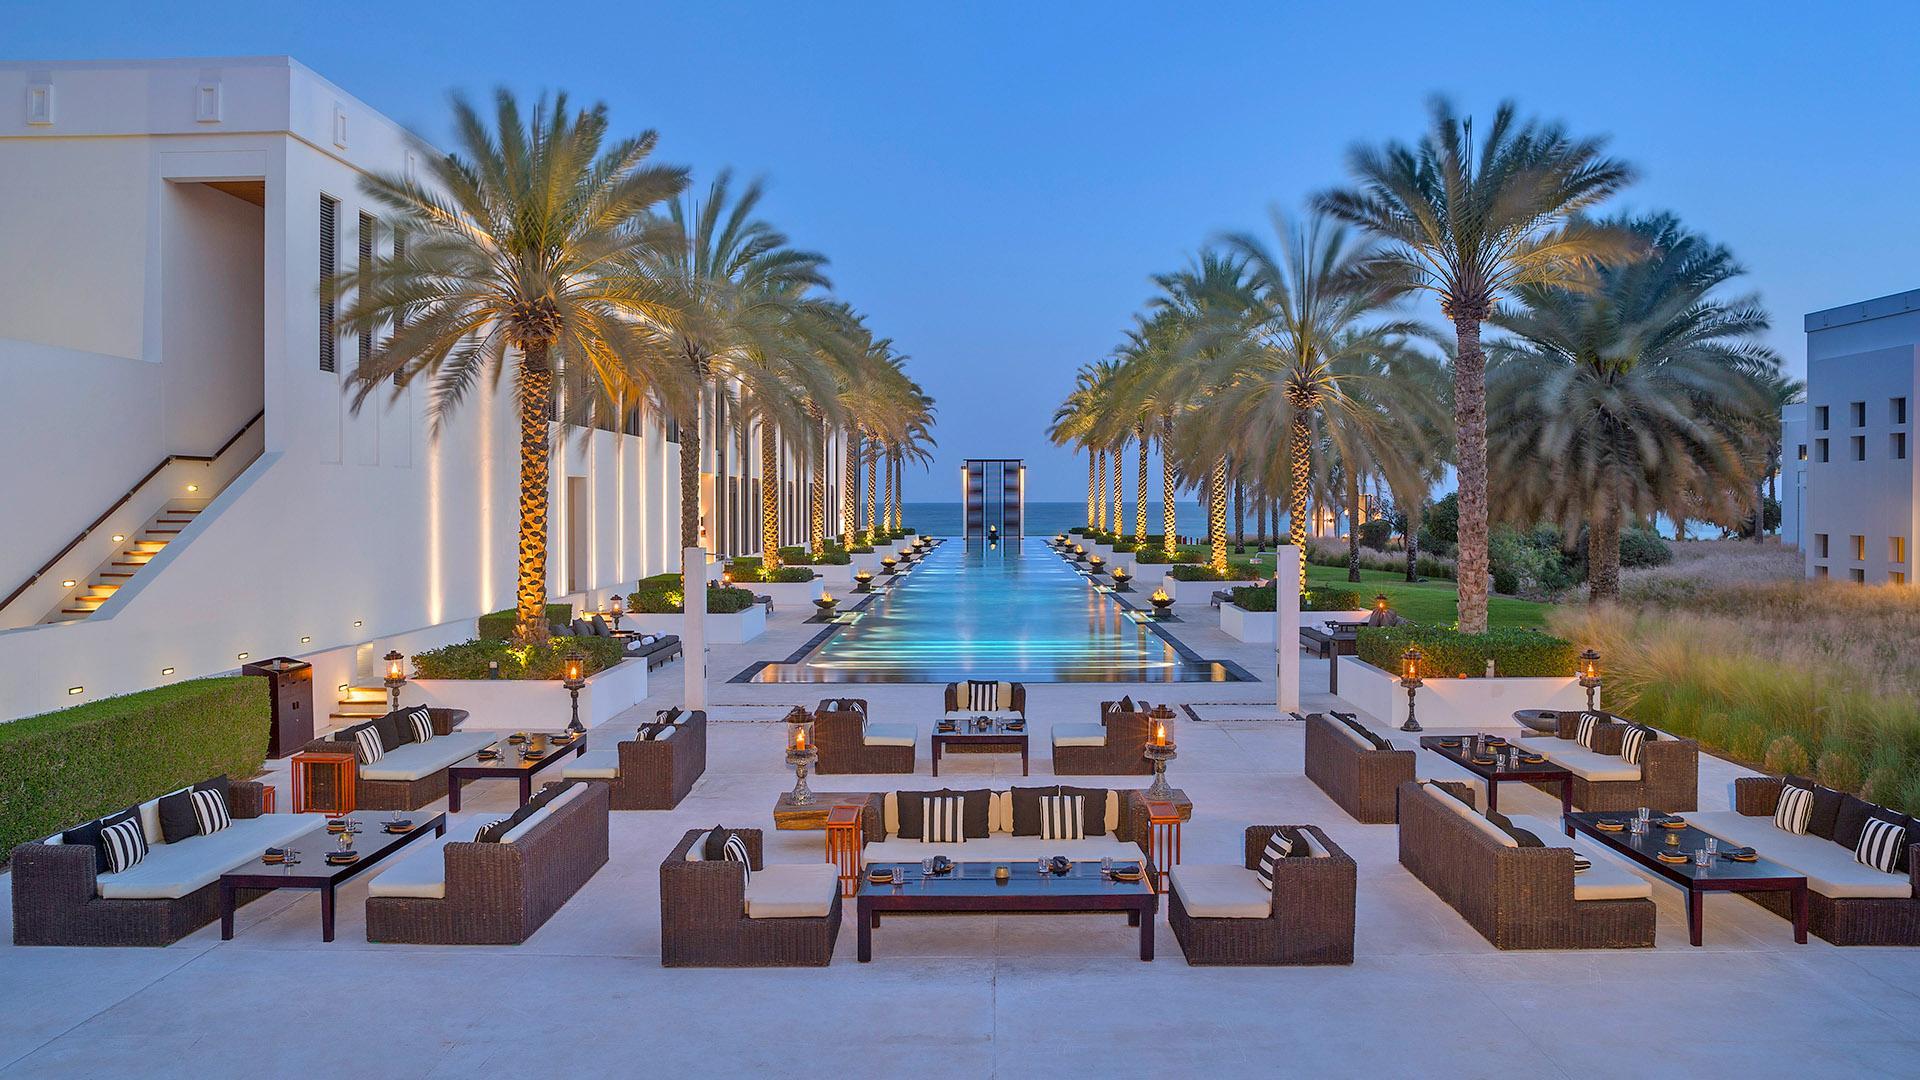 The Chedi Muscat: Arabian Elegance in Oman